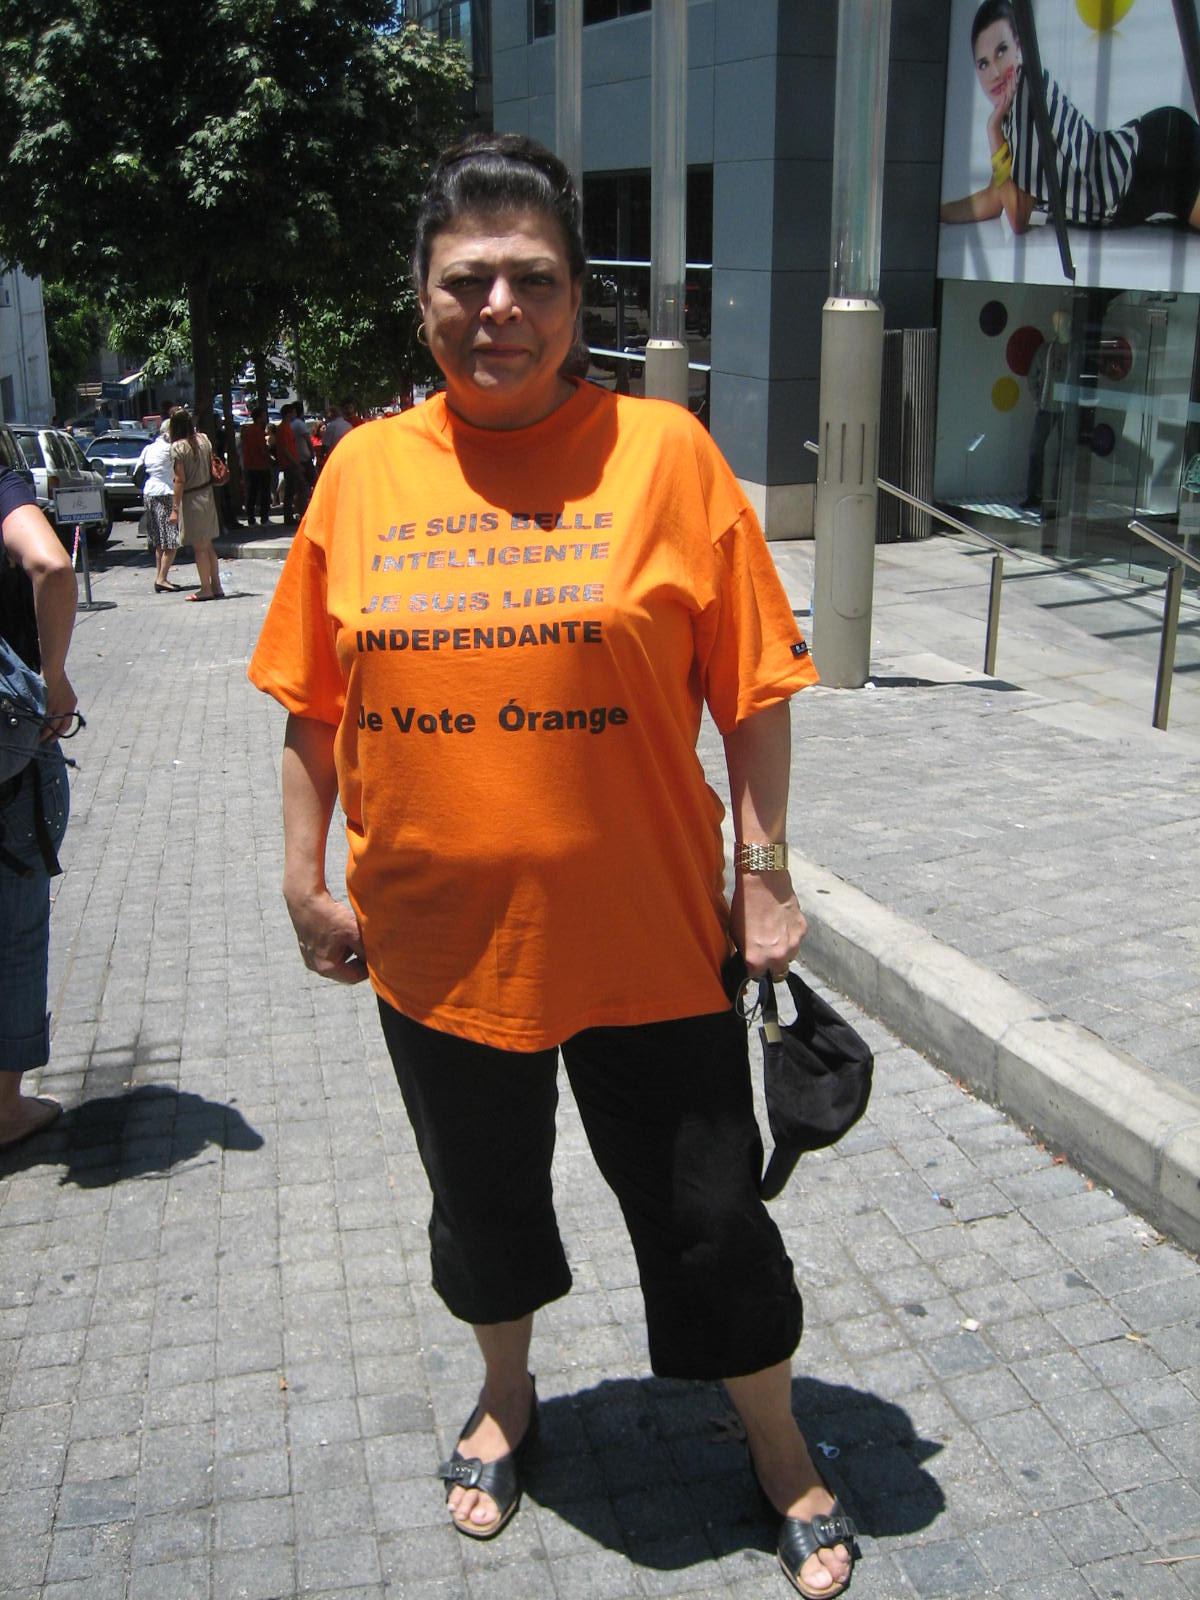 Supporter of Michel Aoun's FPM